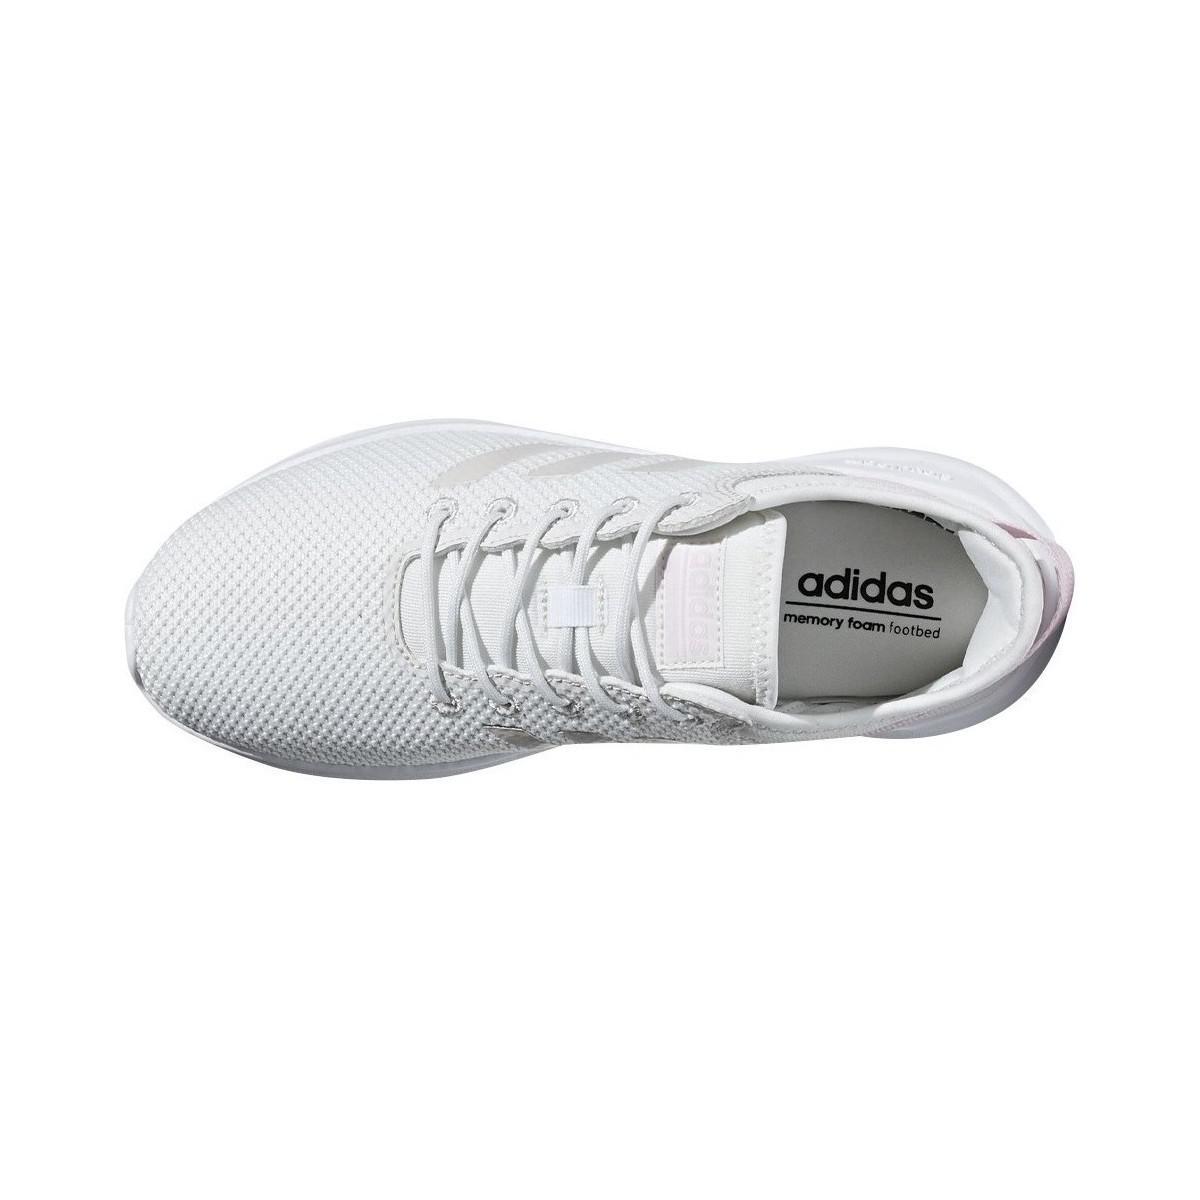 0903134bc191 White Women's ShoestrainersIn Adidas Cloudfoam Qt Flex wkTPOZlXiu